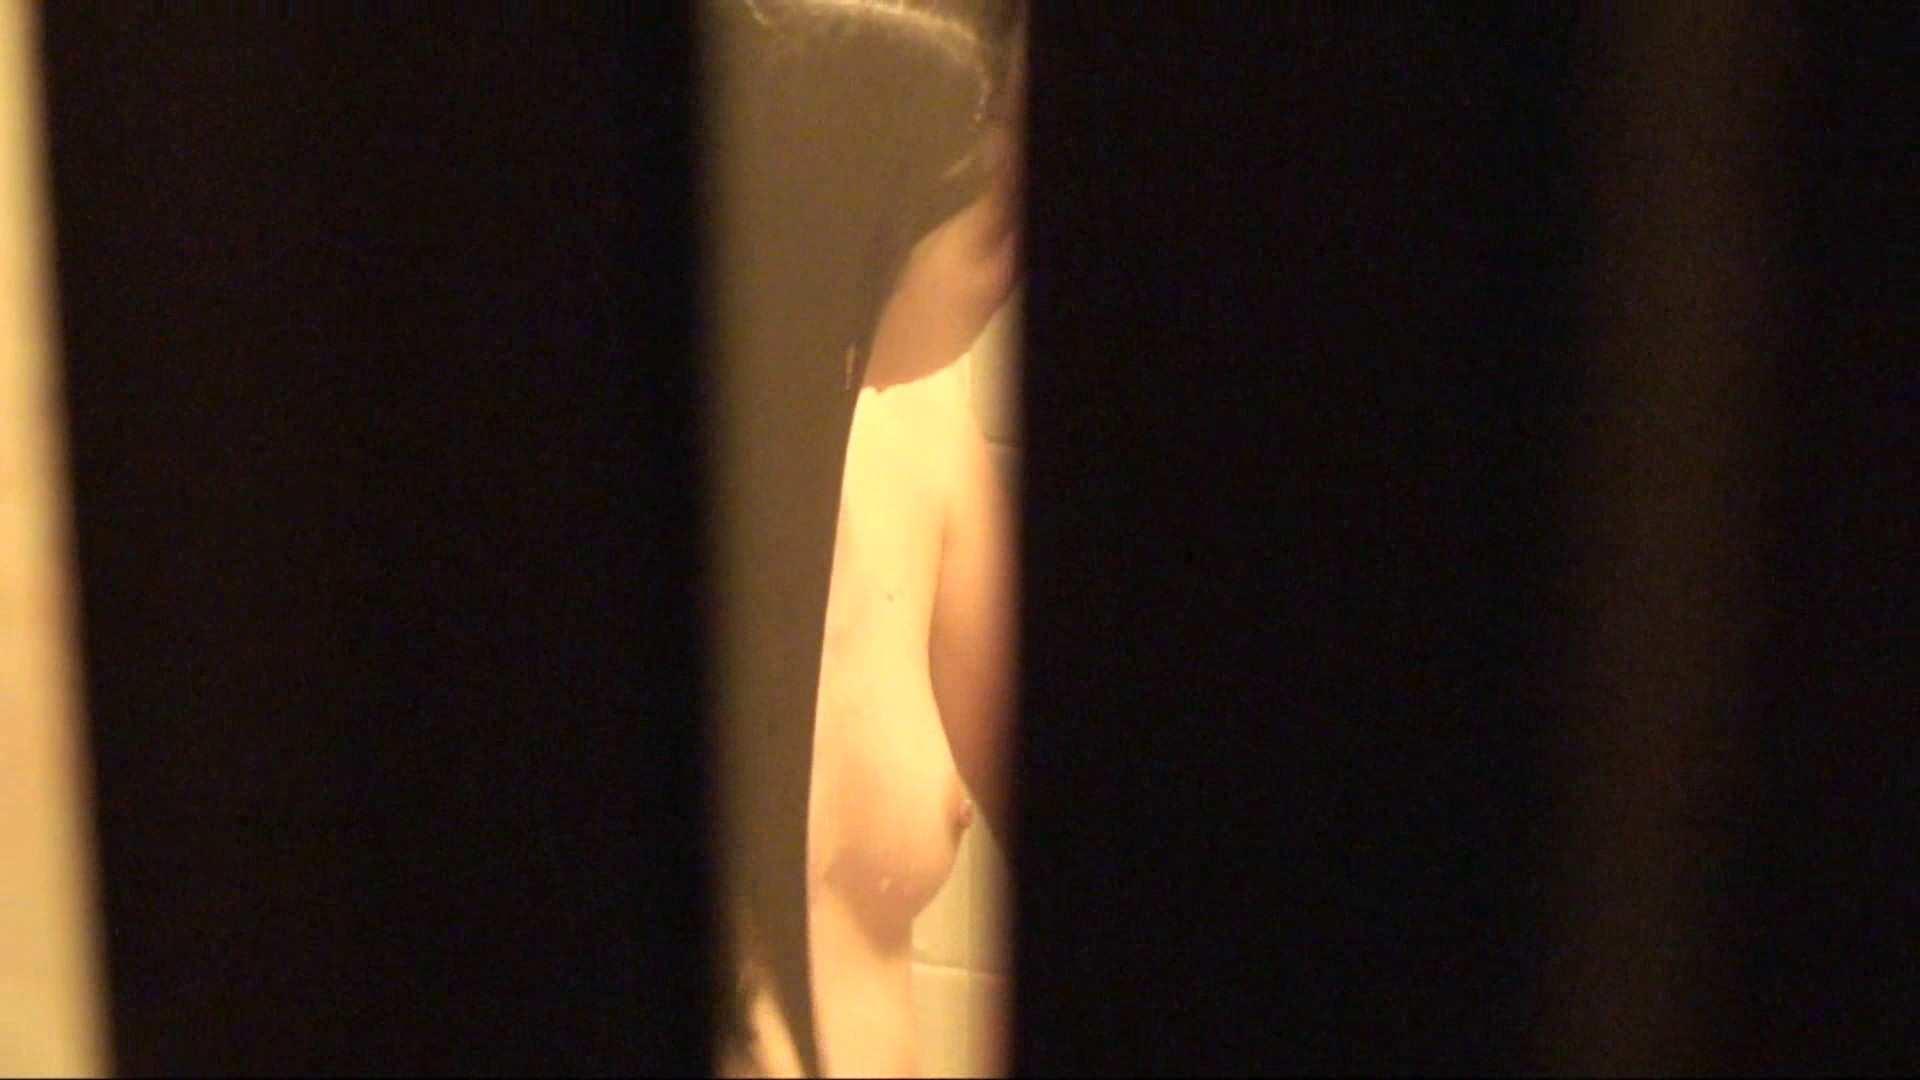 vol.02超可愛すぎる彼女の裸体をハイビジョンで!至近距離での眺め最高! 覗きもの オメコ動画キャプチャ 75枚 55